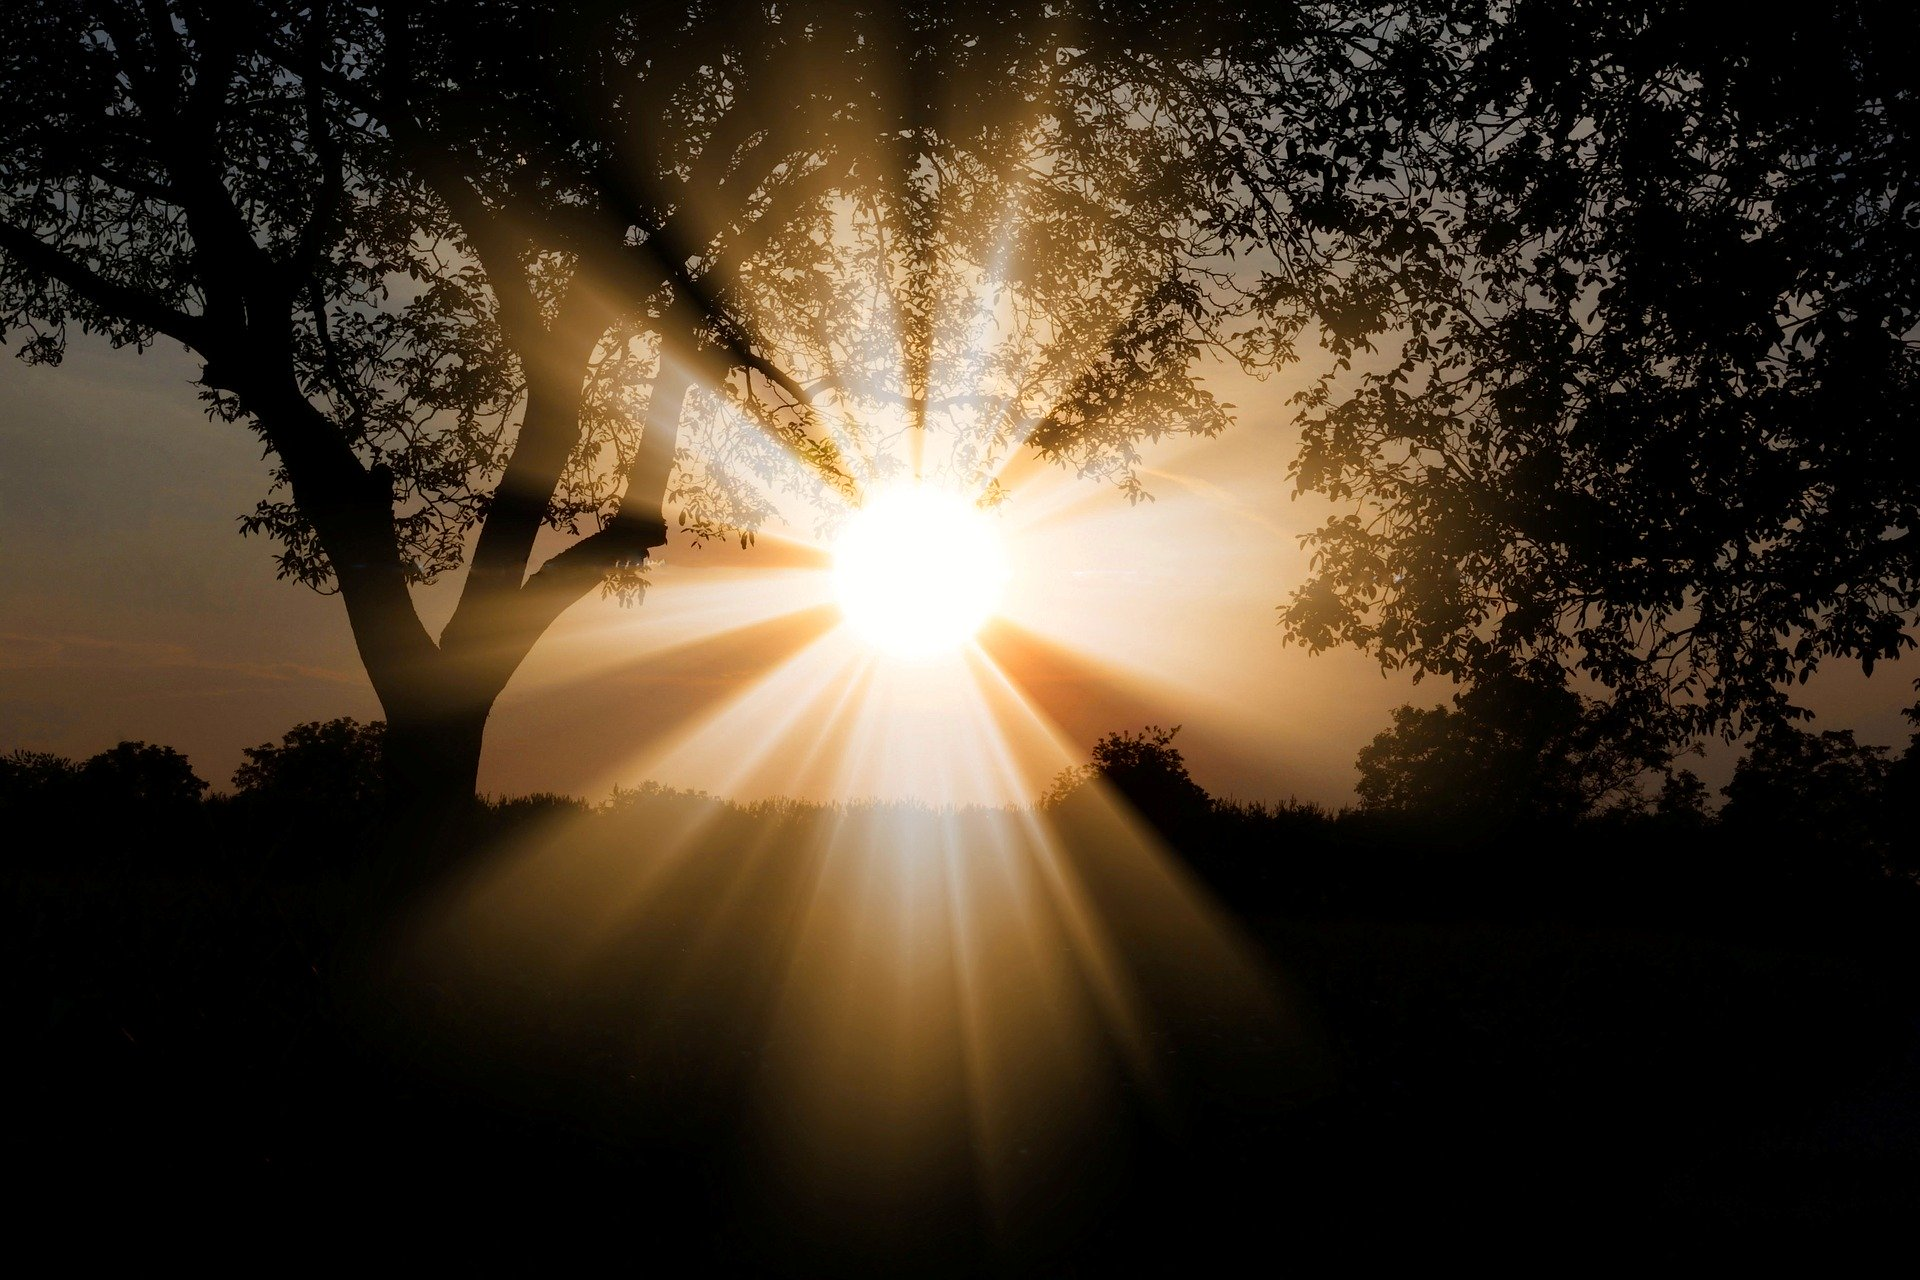 Rays of sunshine through the trees